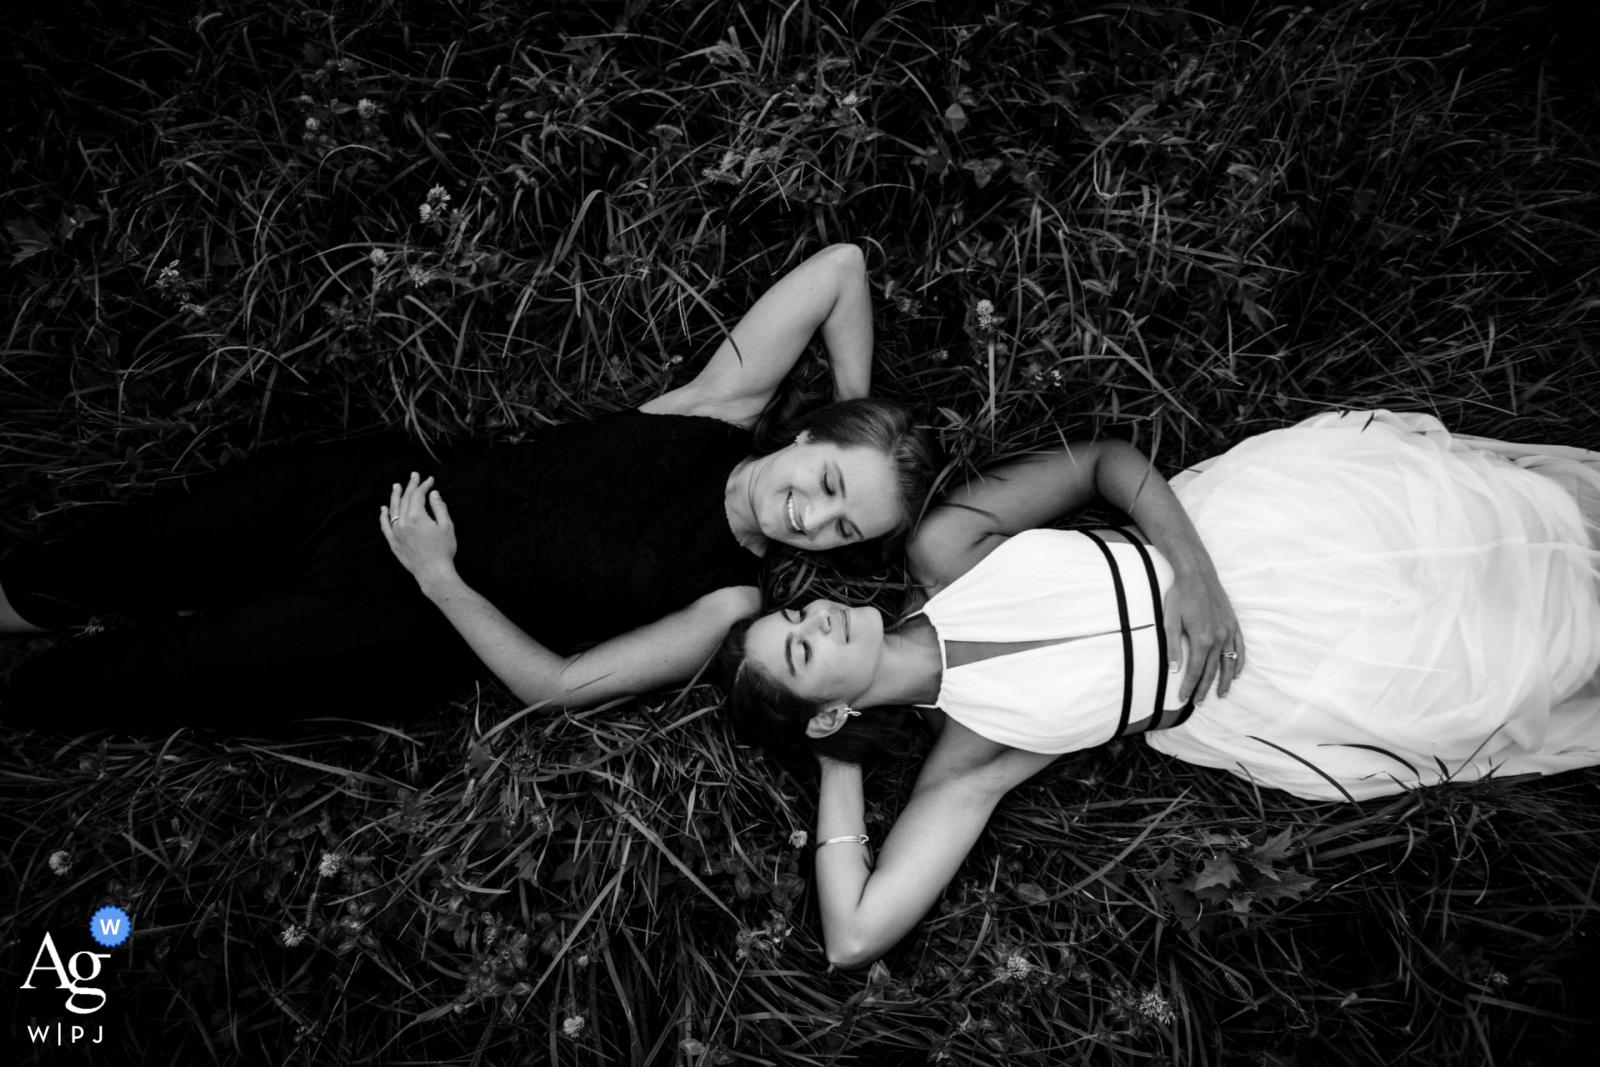 Maryland Backyard Wedding portrait - Lying in the grass